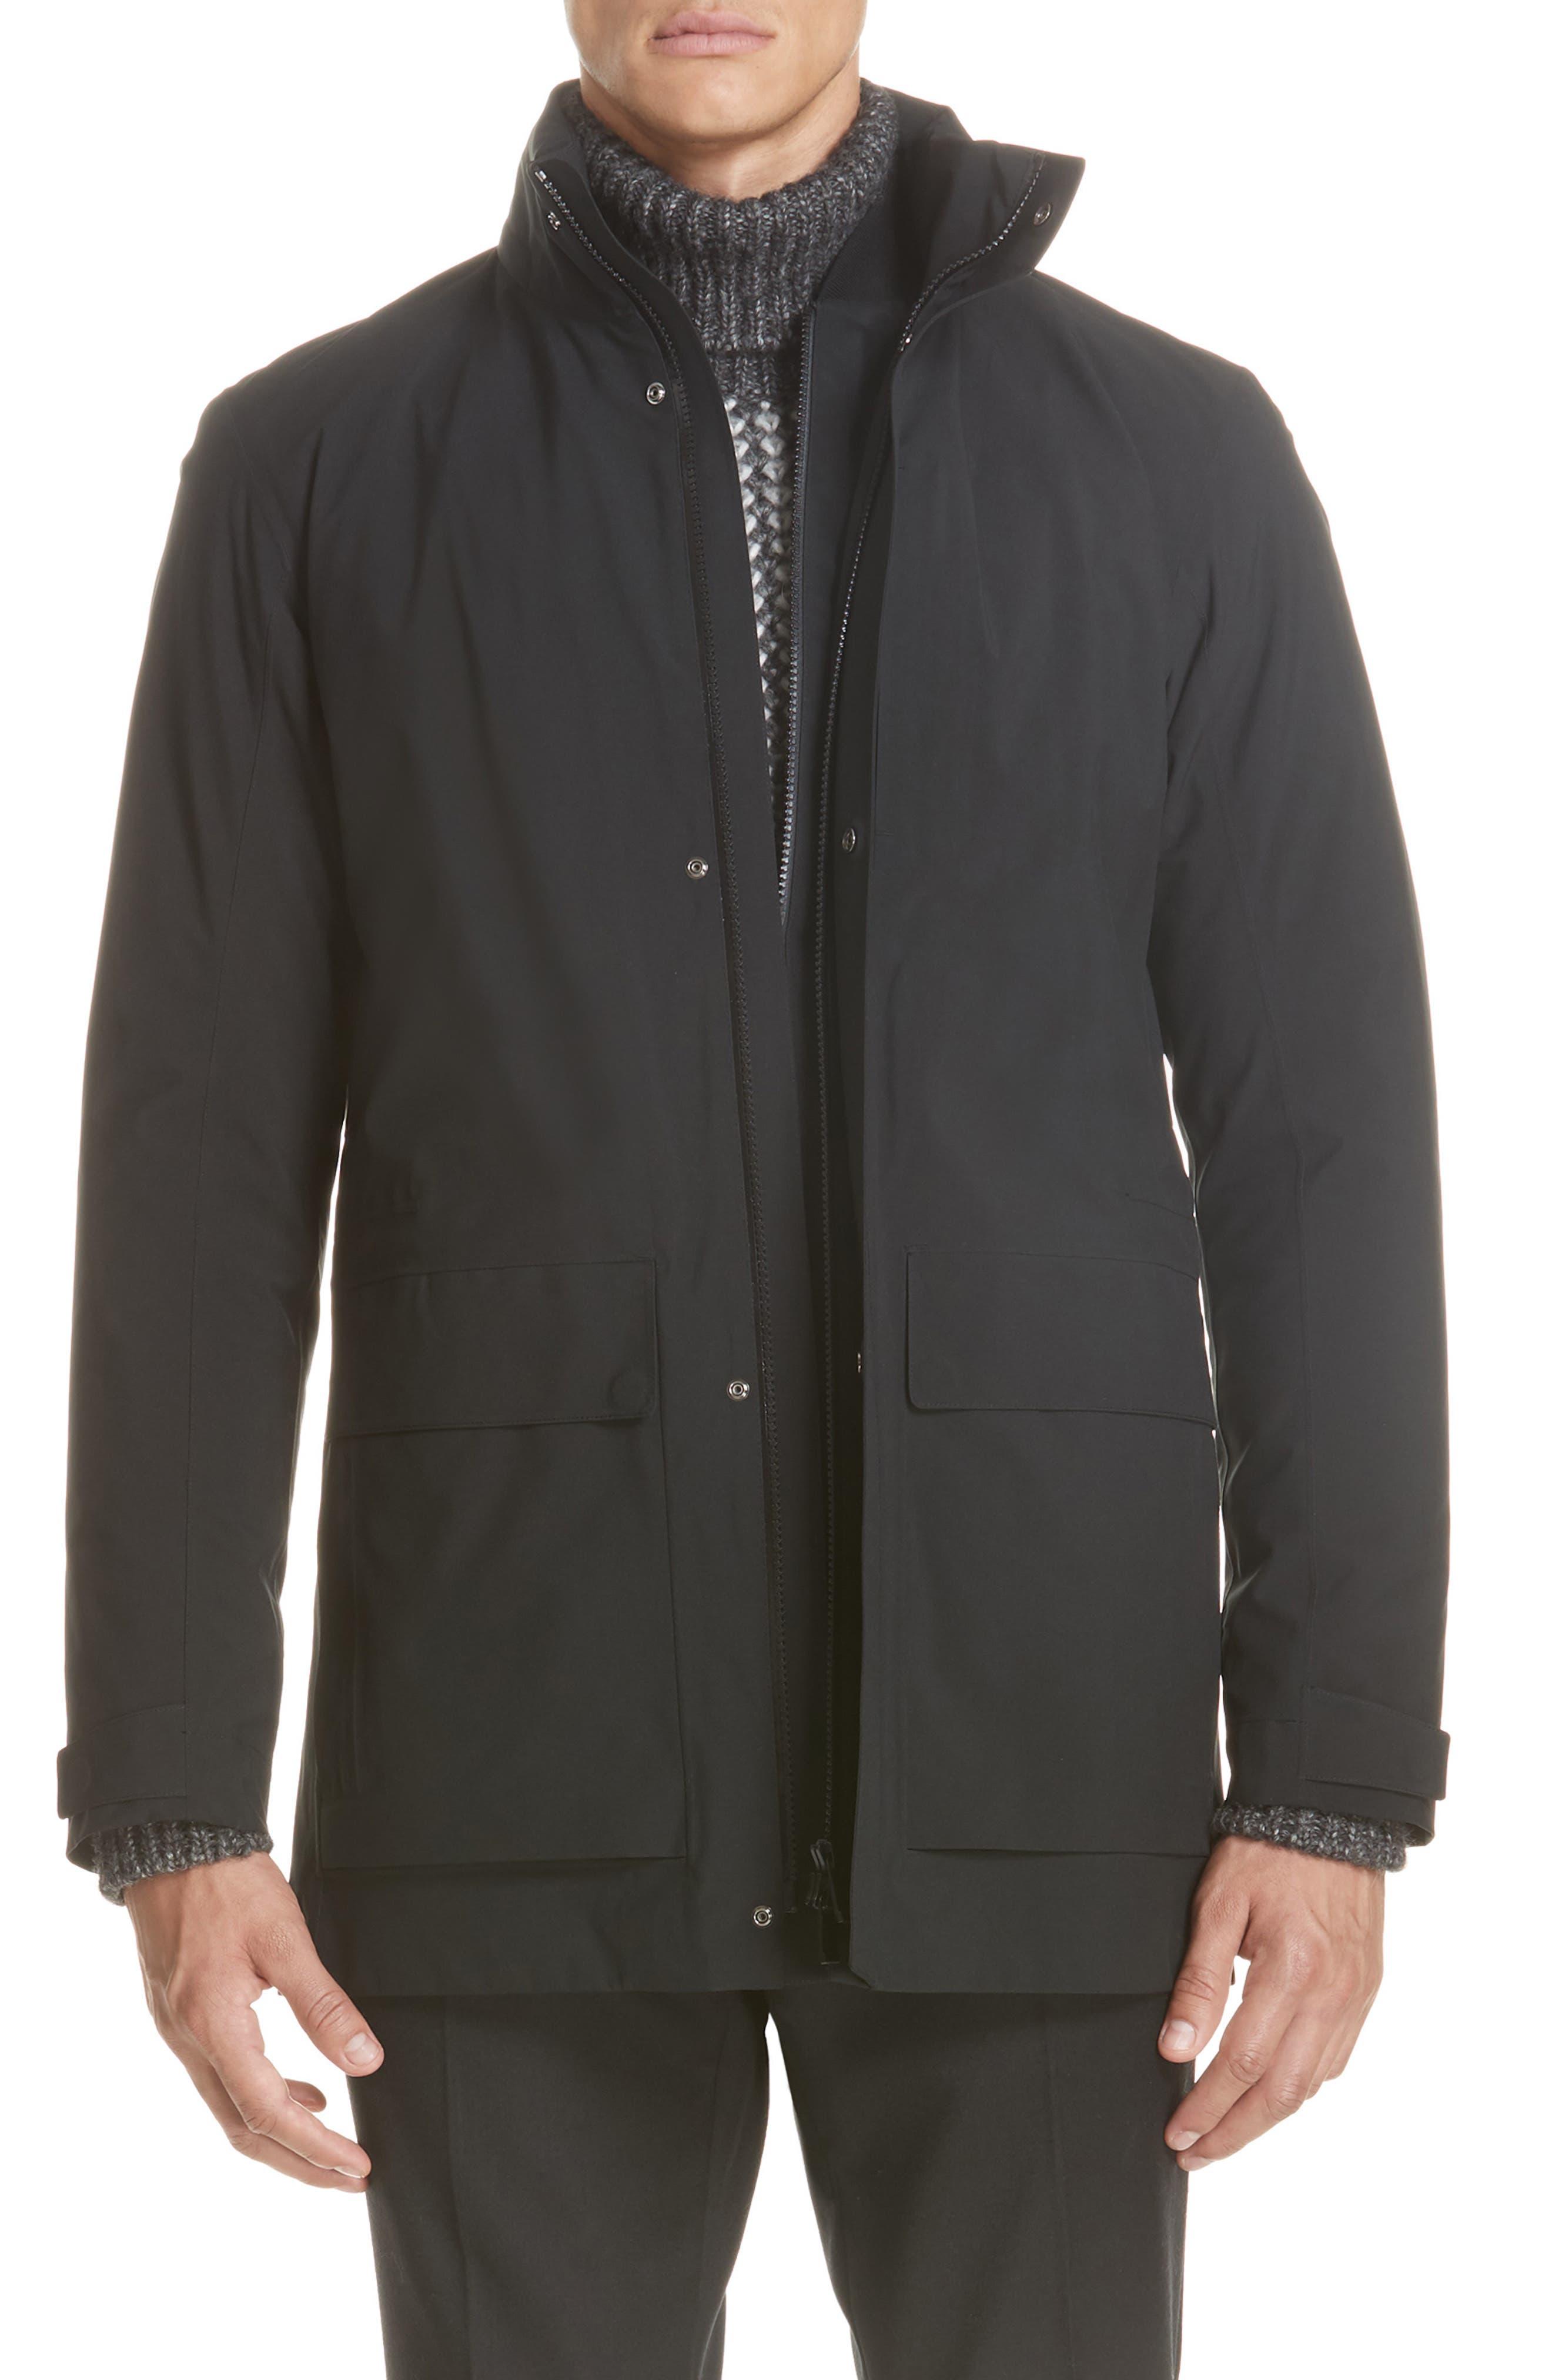 Z Zenga Trim Fit 3-in-1 Jacket,                             Main thumbnail 1, color,                             BLACK